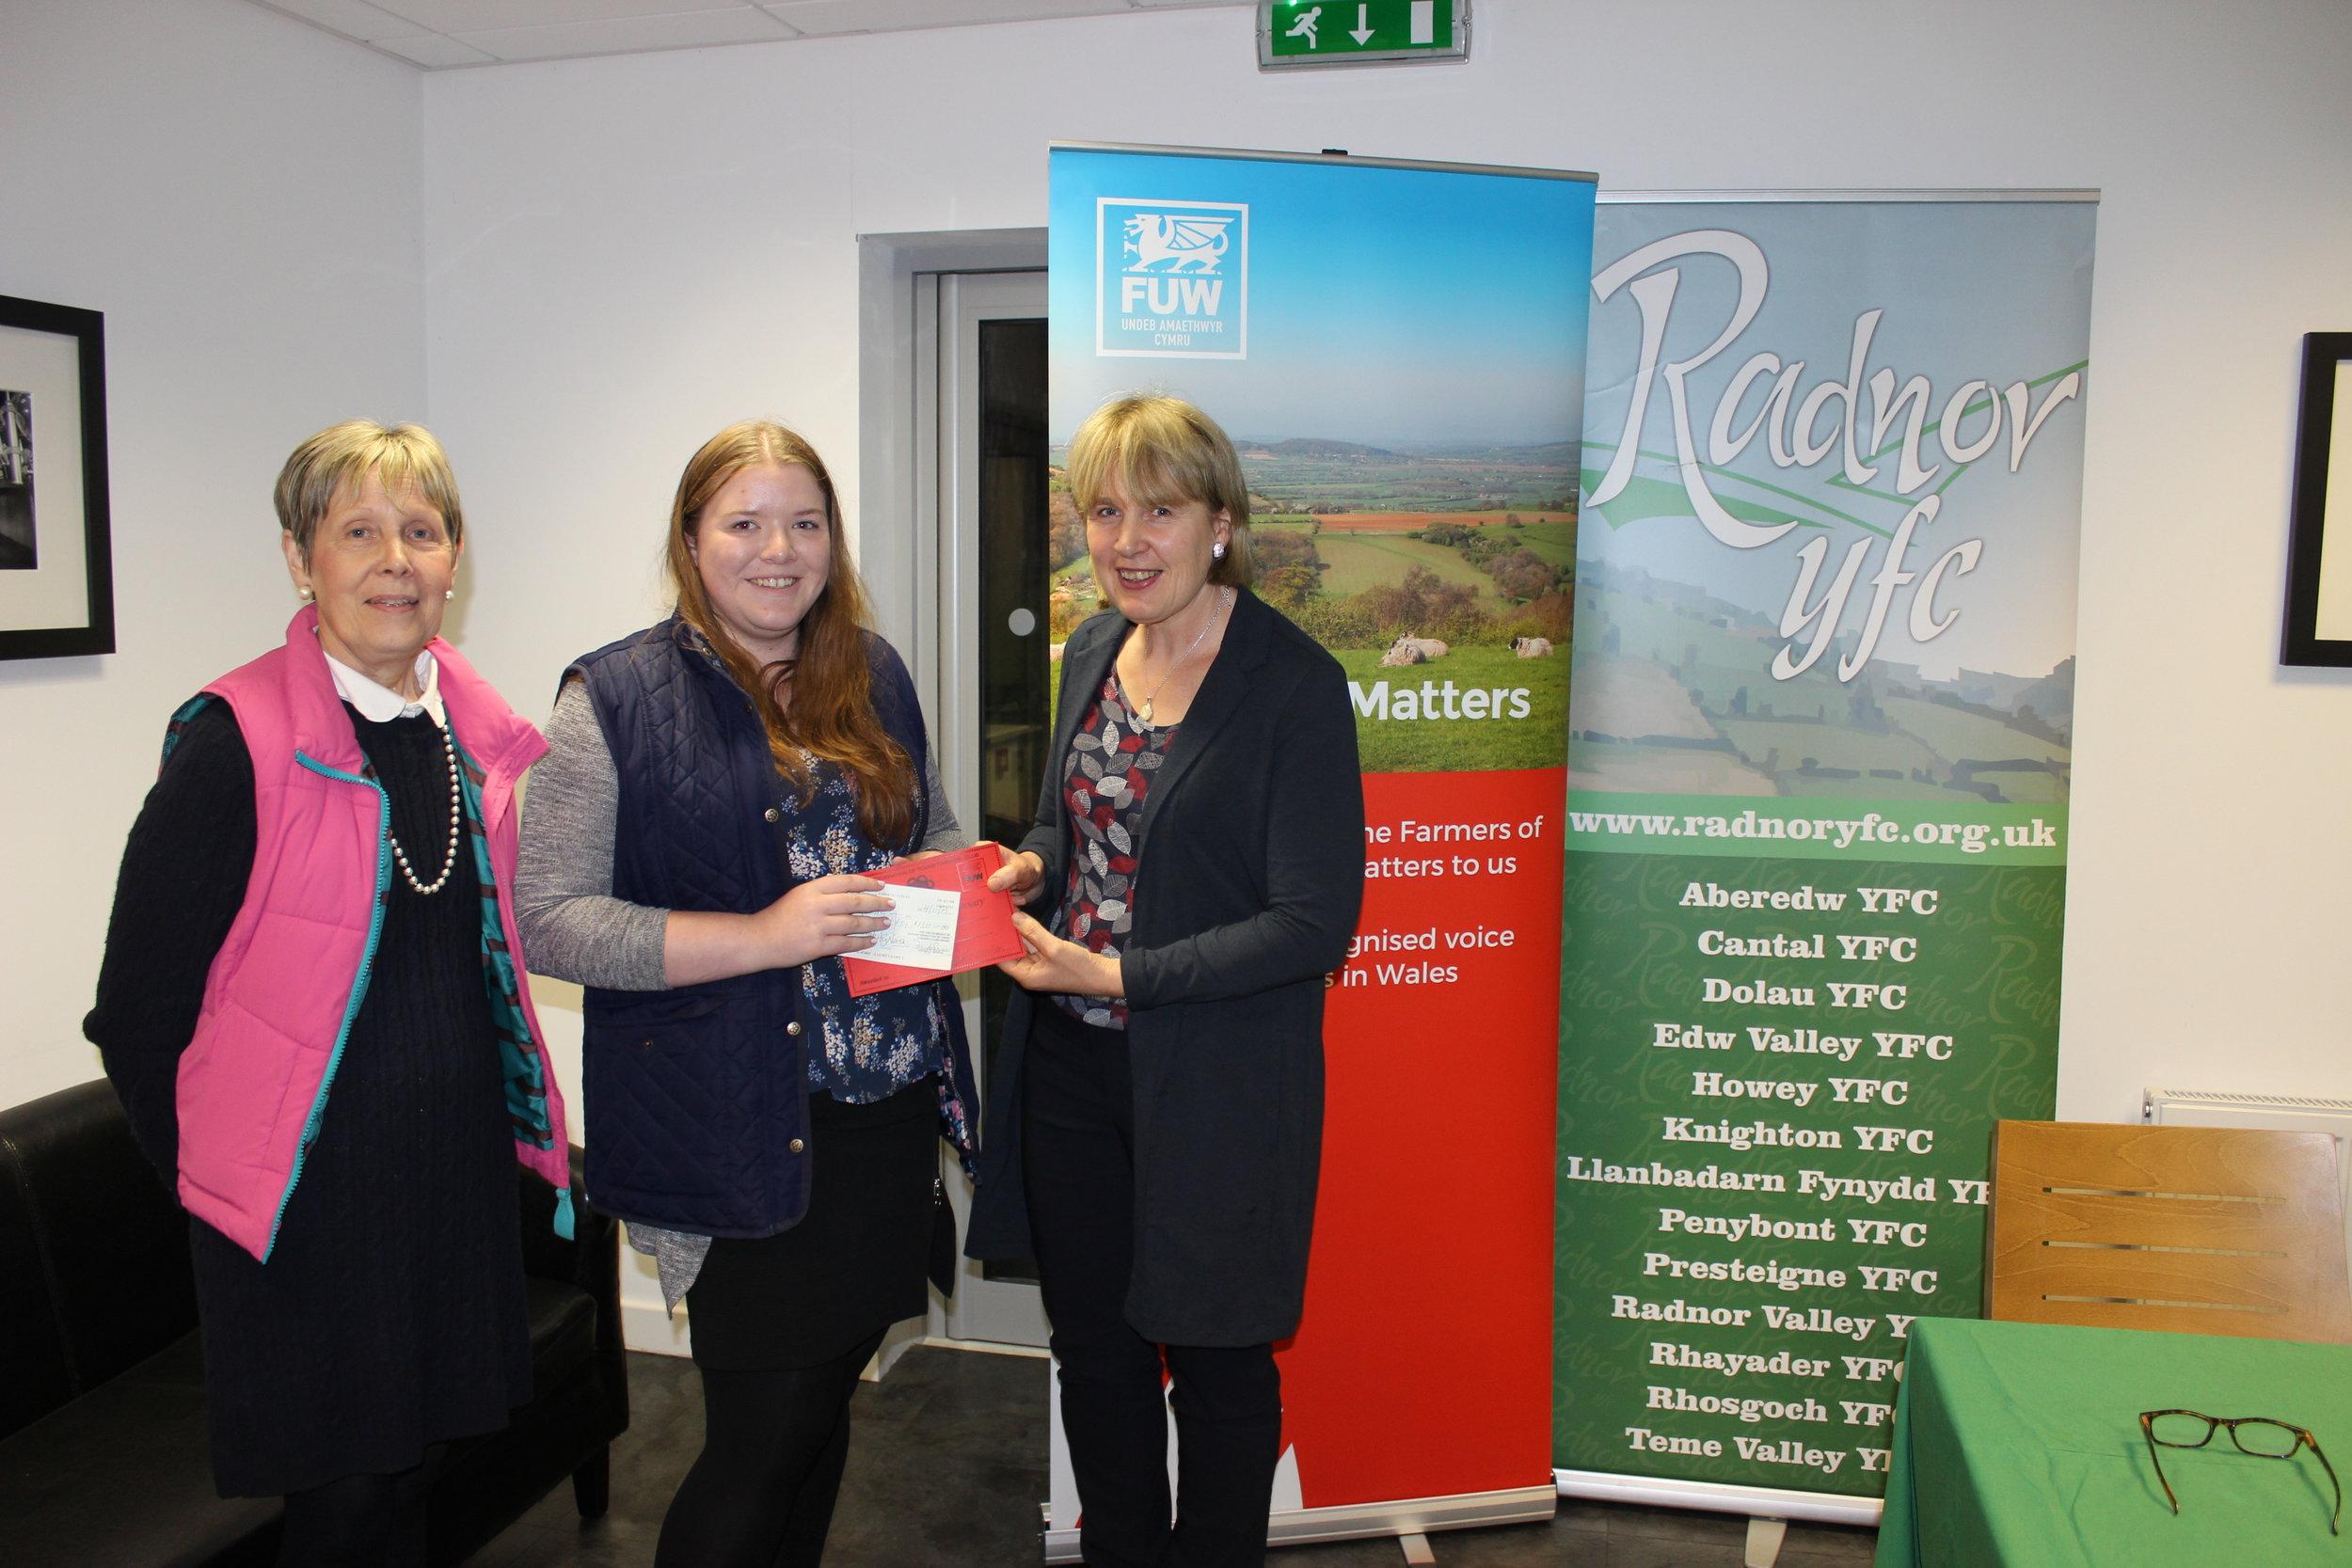 Natalie Wood, Knighton YFC winning the Bursary Competition with judges Rhian Duggan & Gill Price.